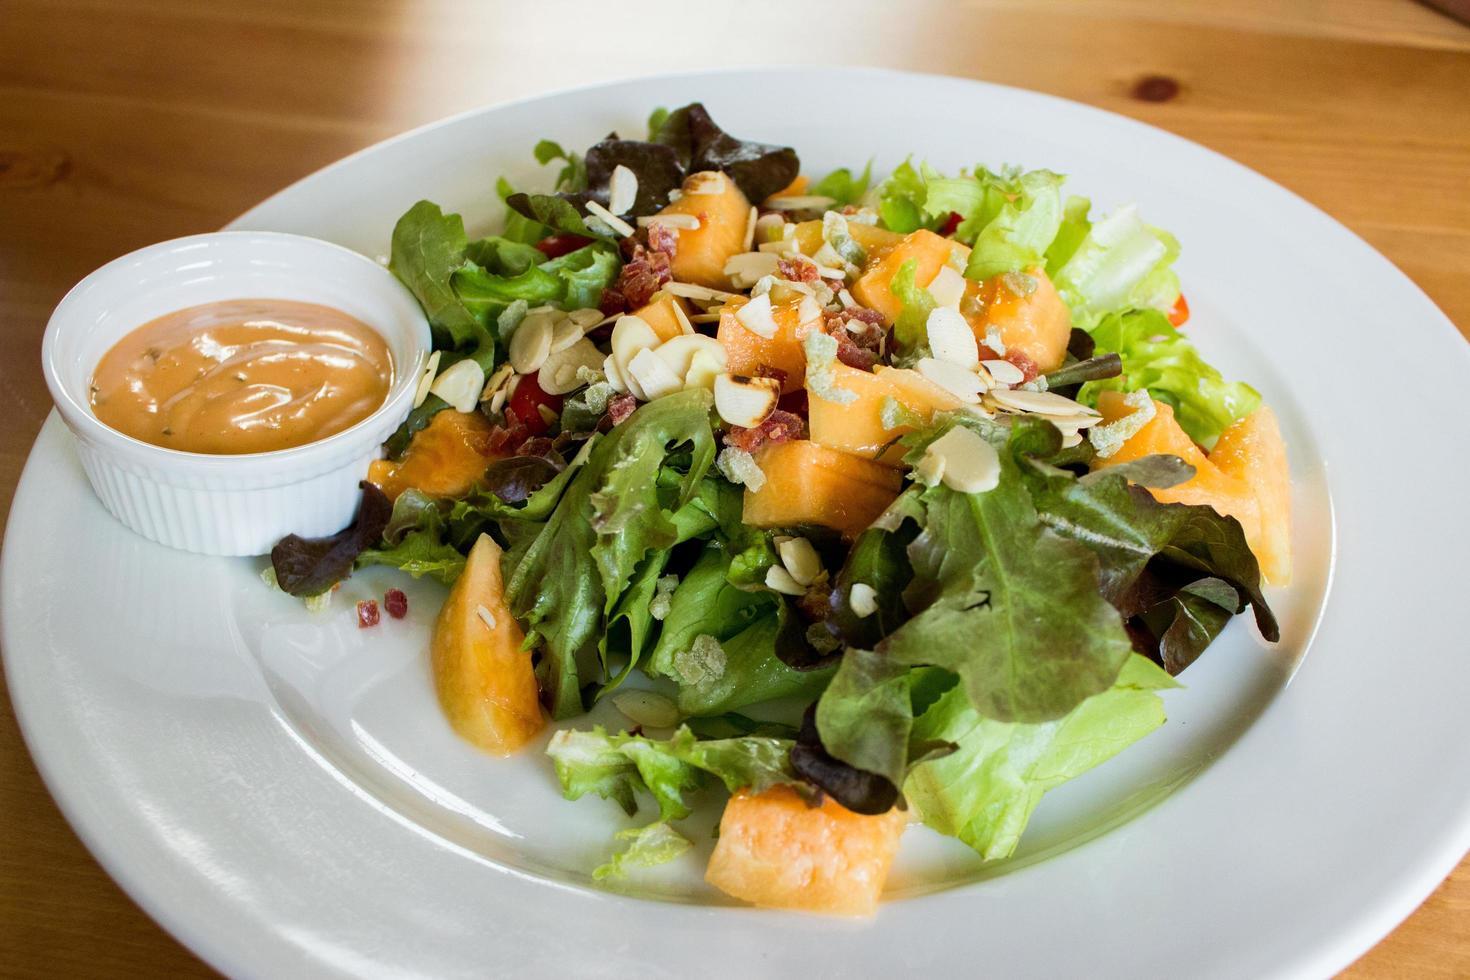 salade en dressing op witte schotel foto